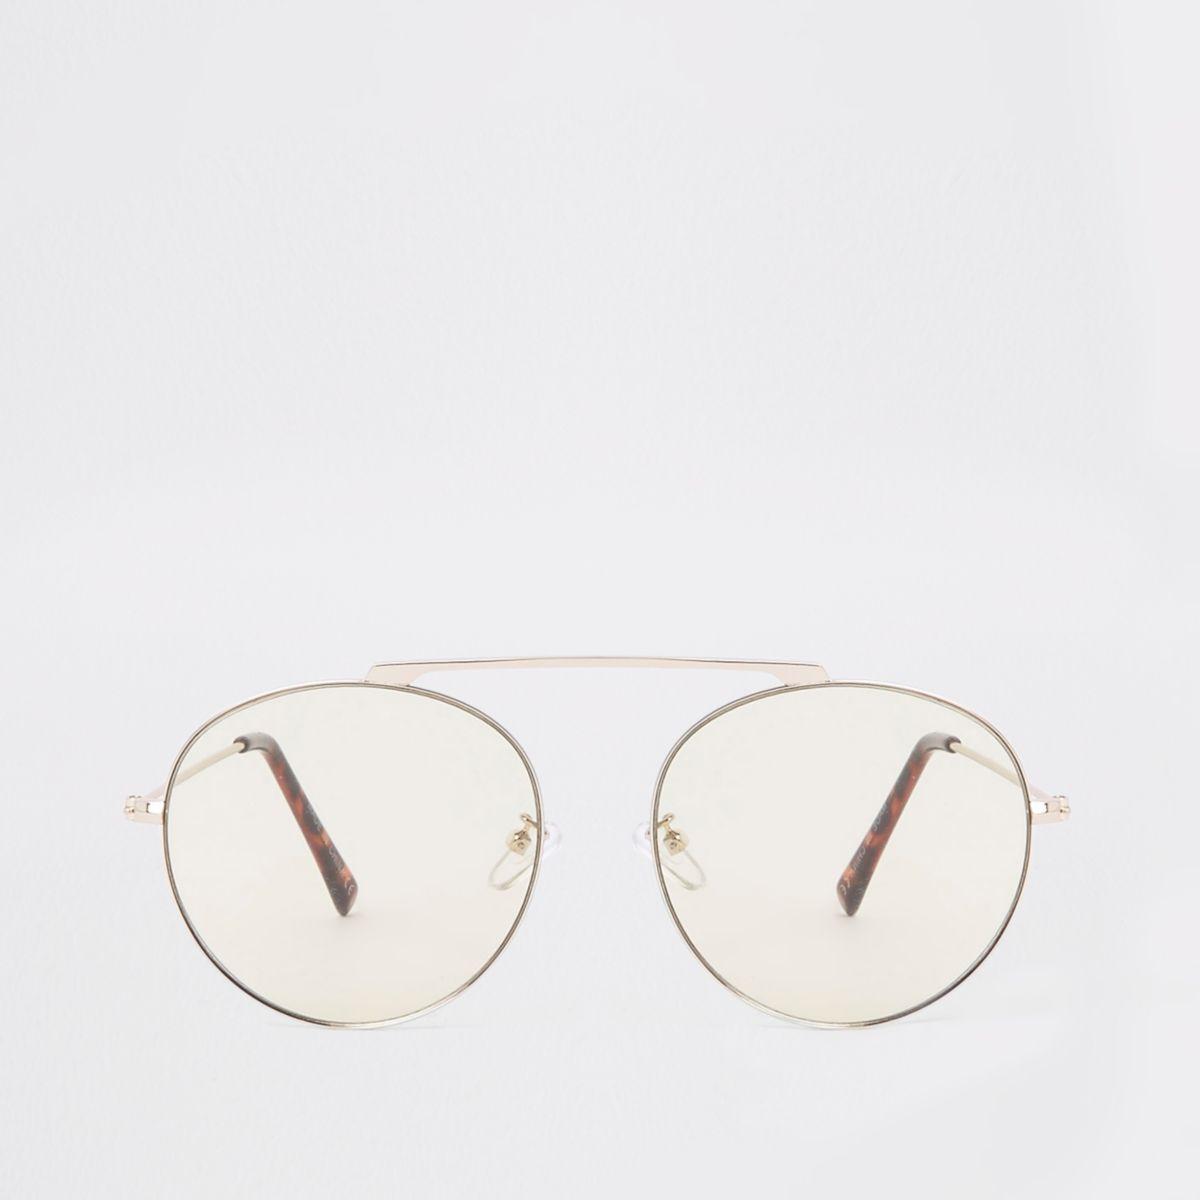 Silver tone bridgeless aviator sunglasses